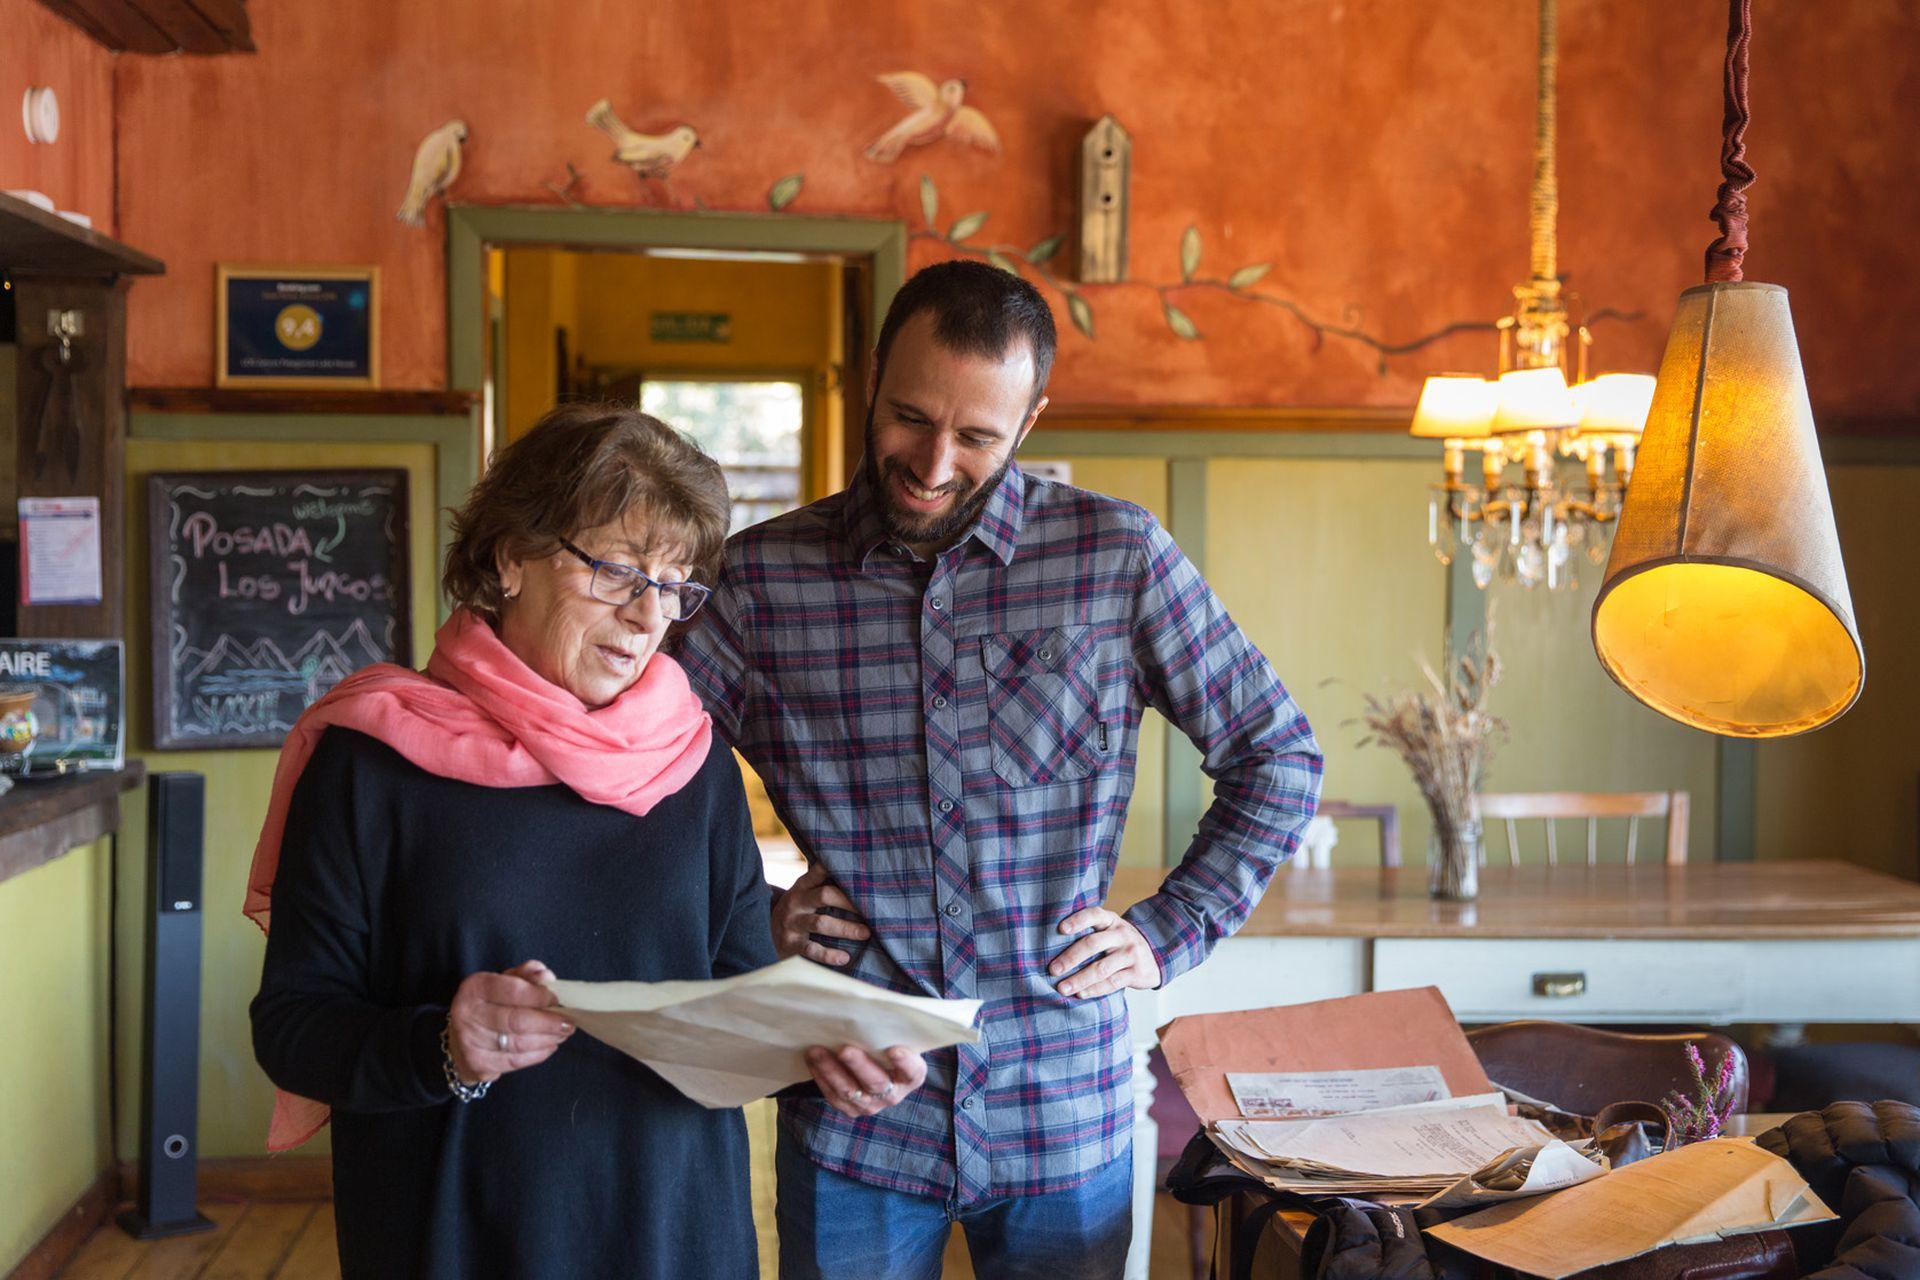 Lucas Bozzano convocó a Albertina Rahm para hacer un documental sobre la hostería.